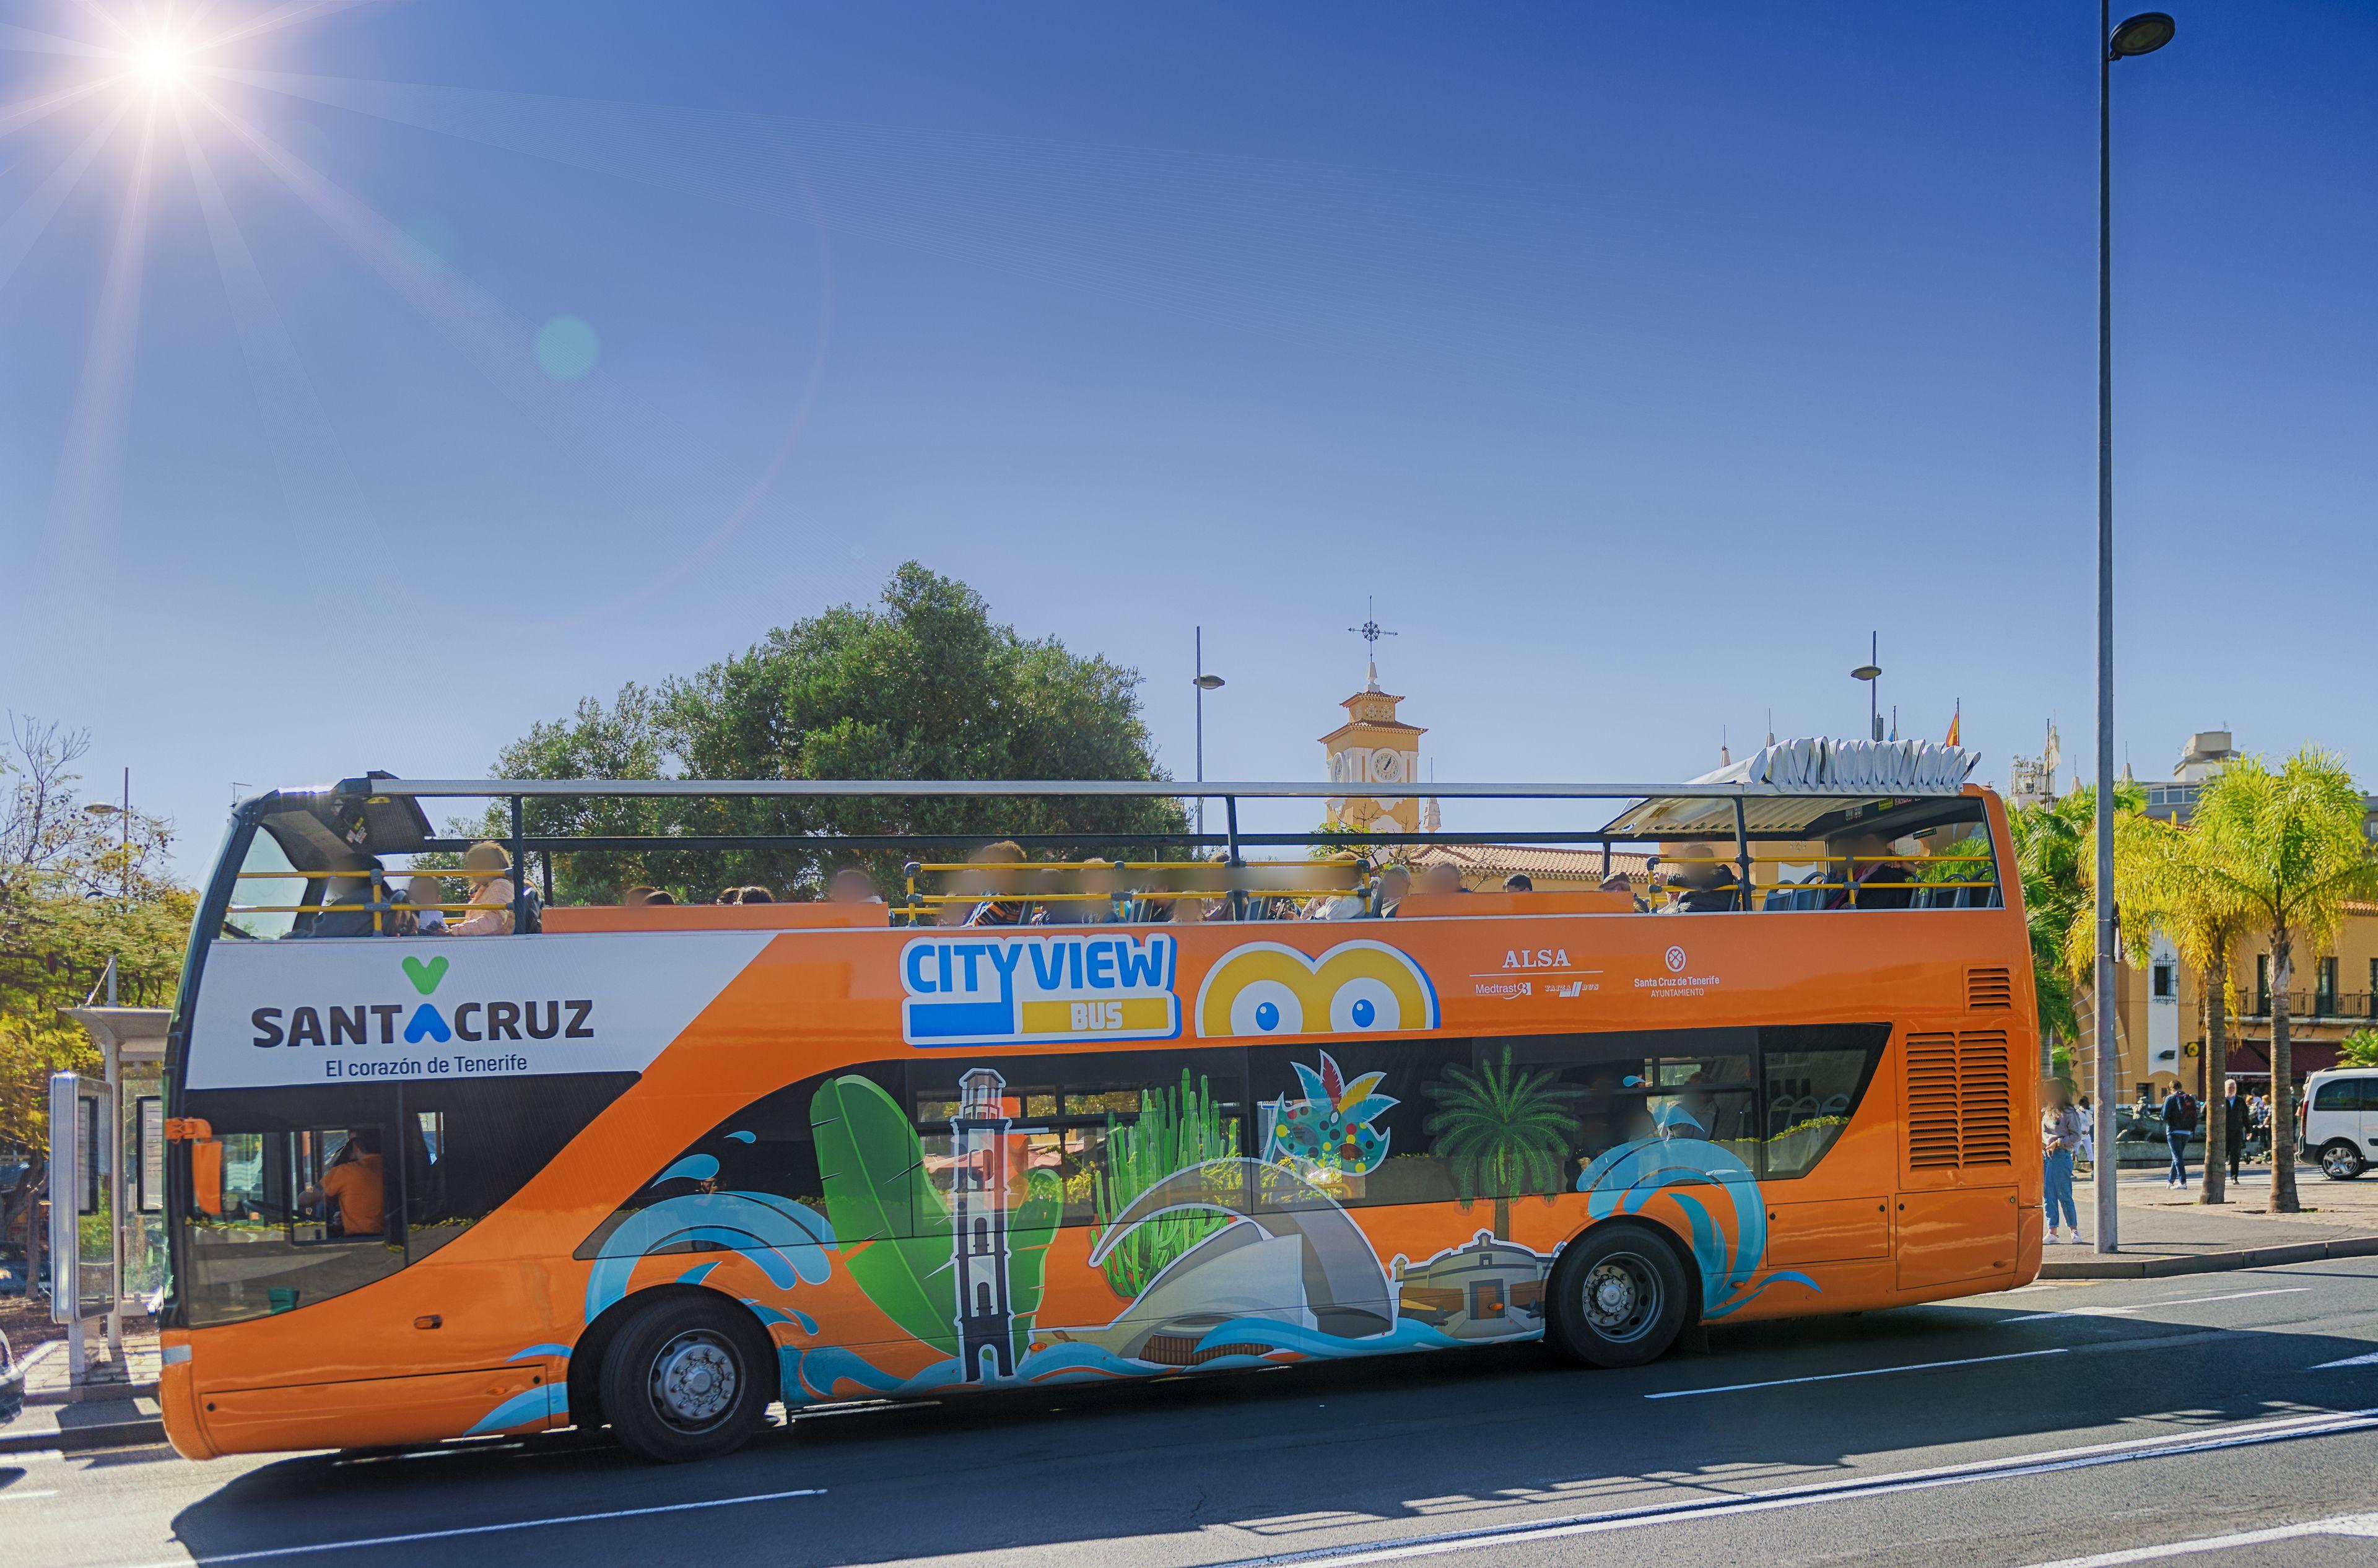 Santa Cruzin hop-on hop-off -kiertoajelu bussilla ja junalla